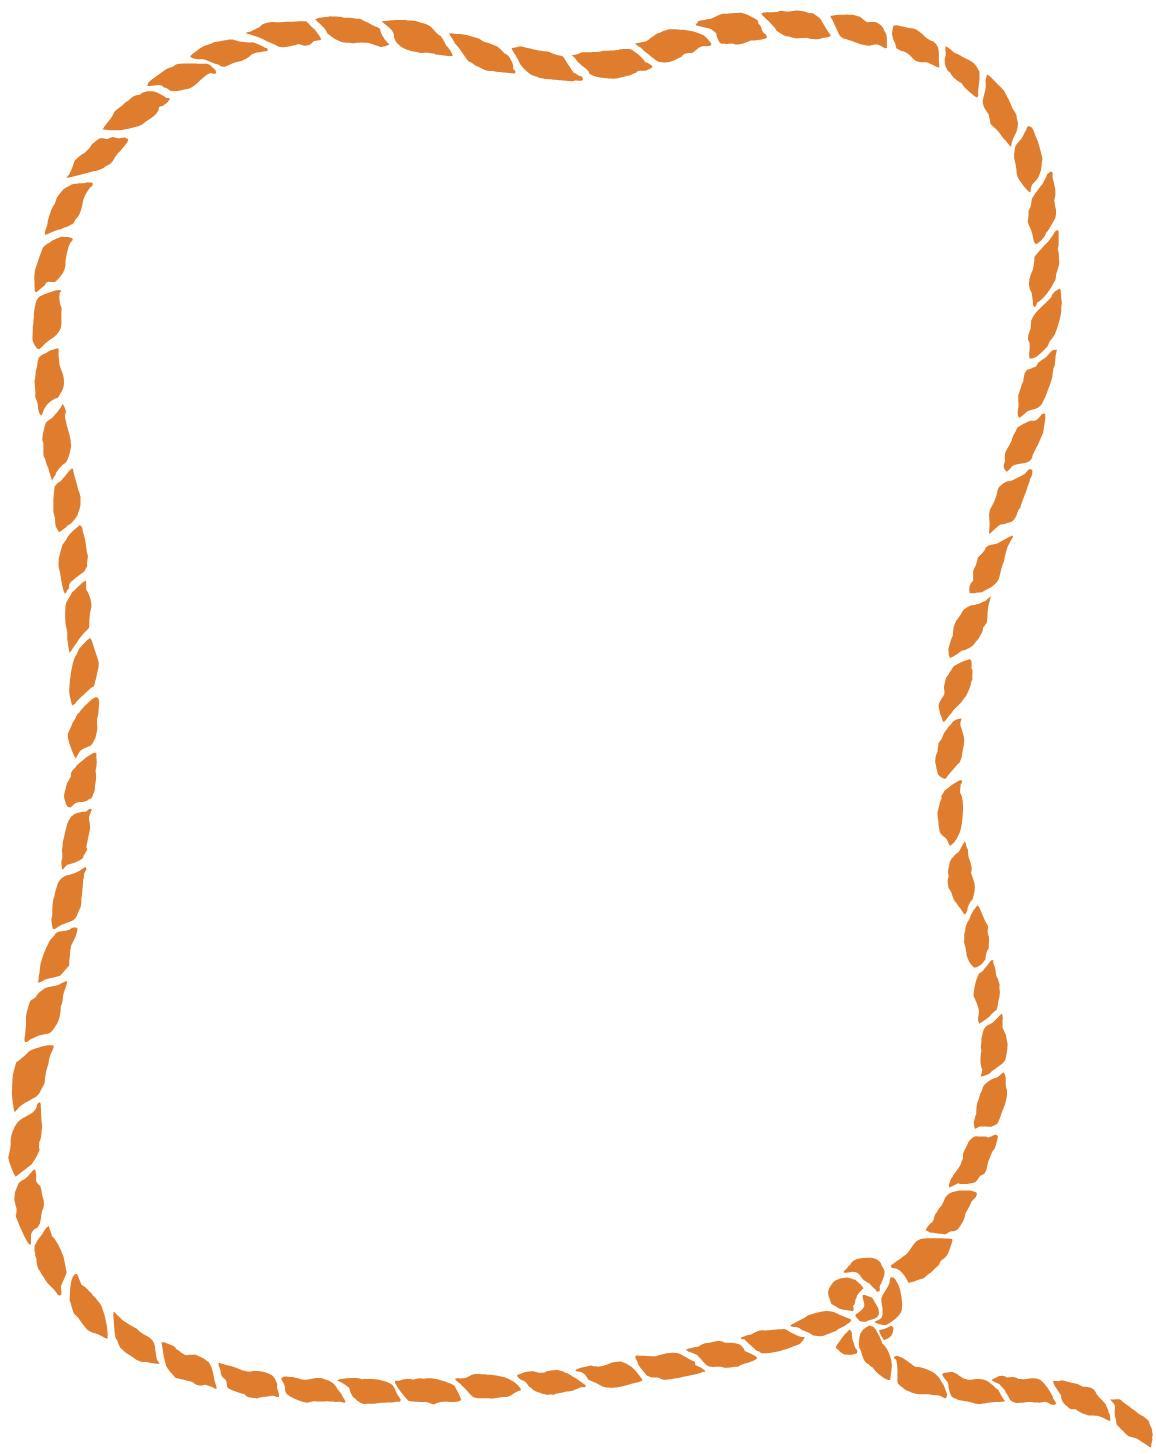 Rope Border Clip Art N46 free image.